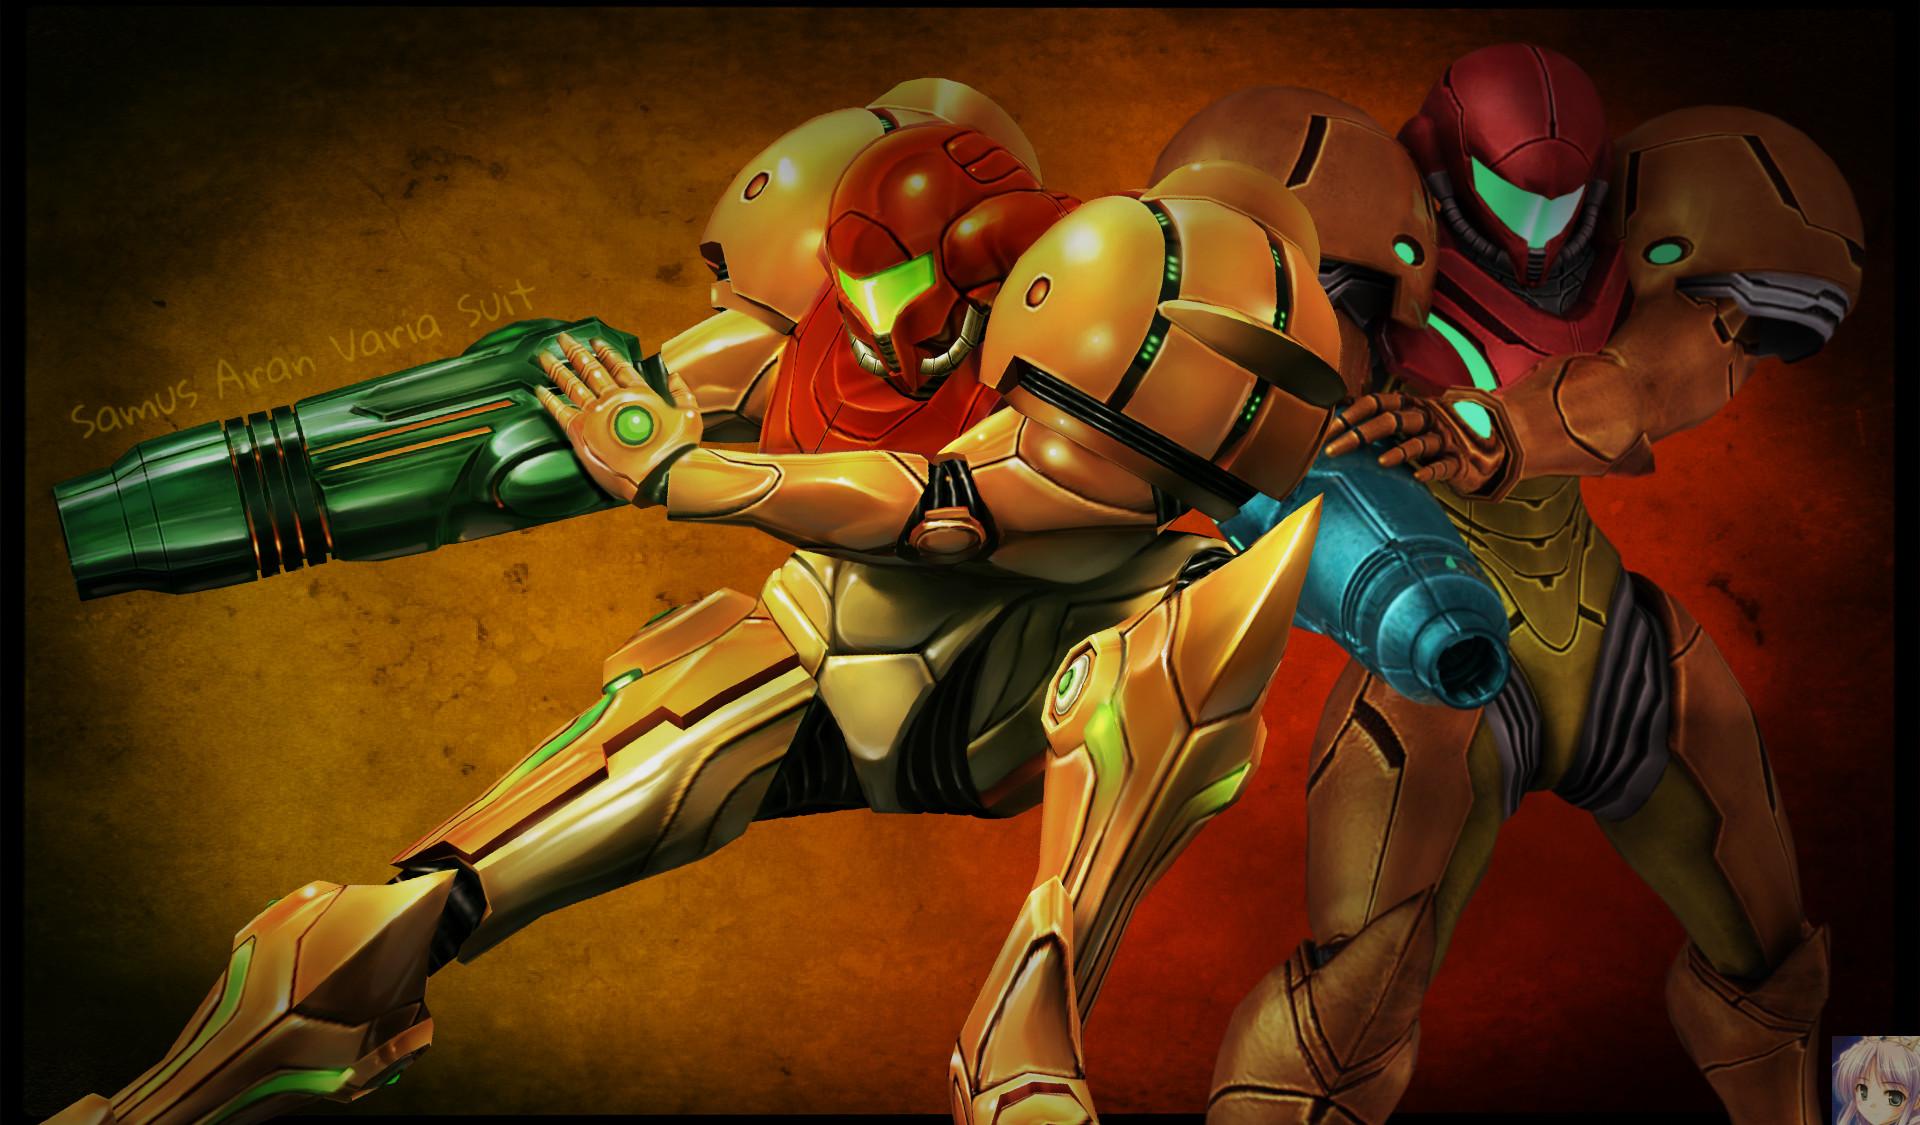 … Metroid Samus Aran Varia Suit wallpaper by FireFox4X